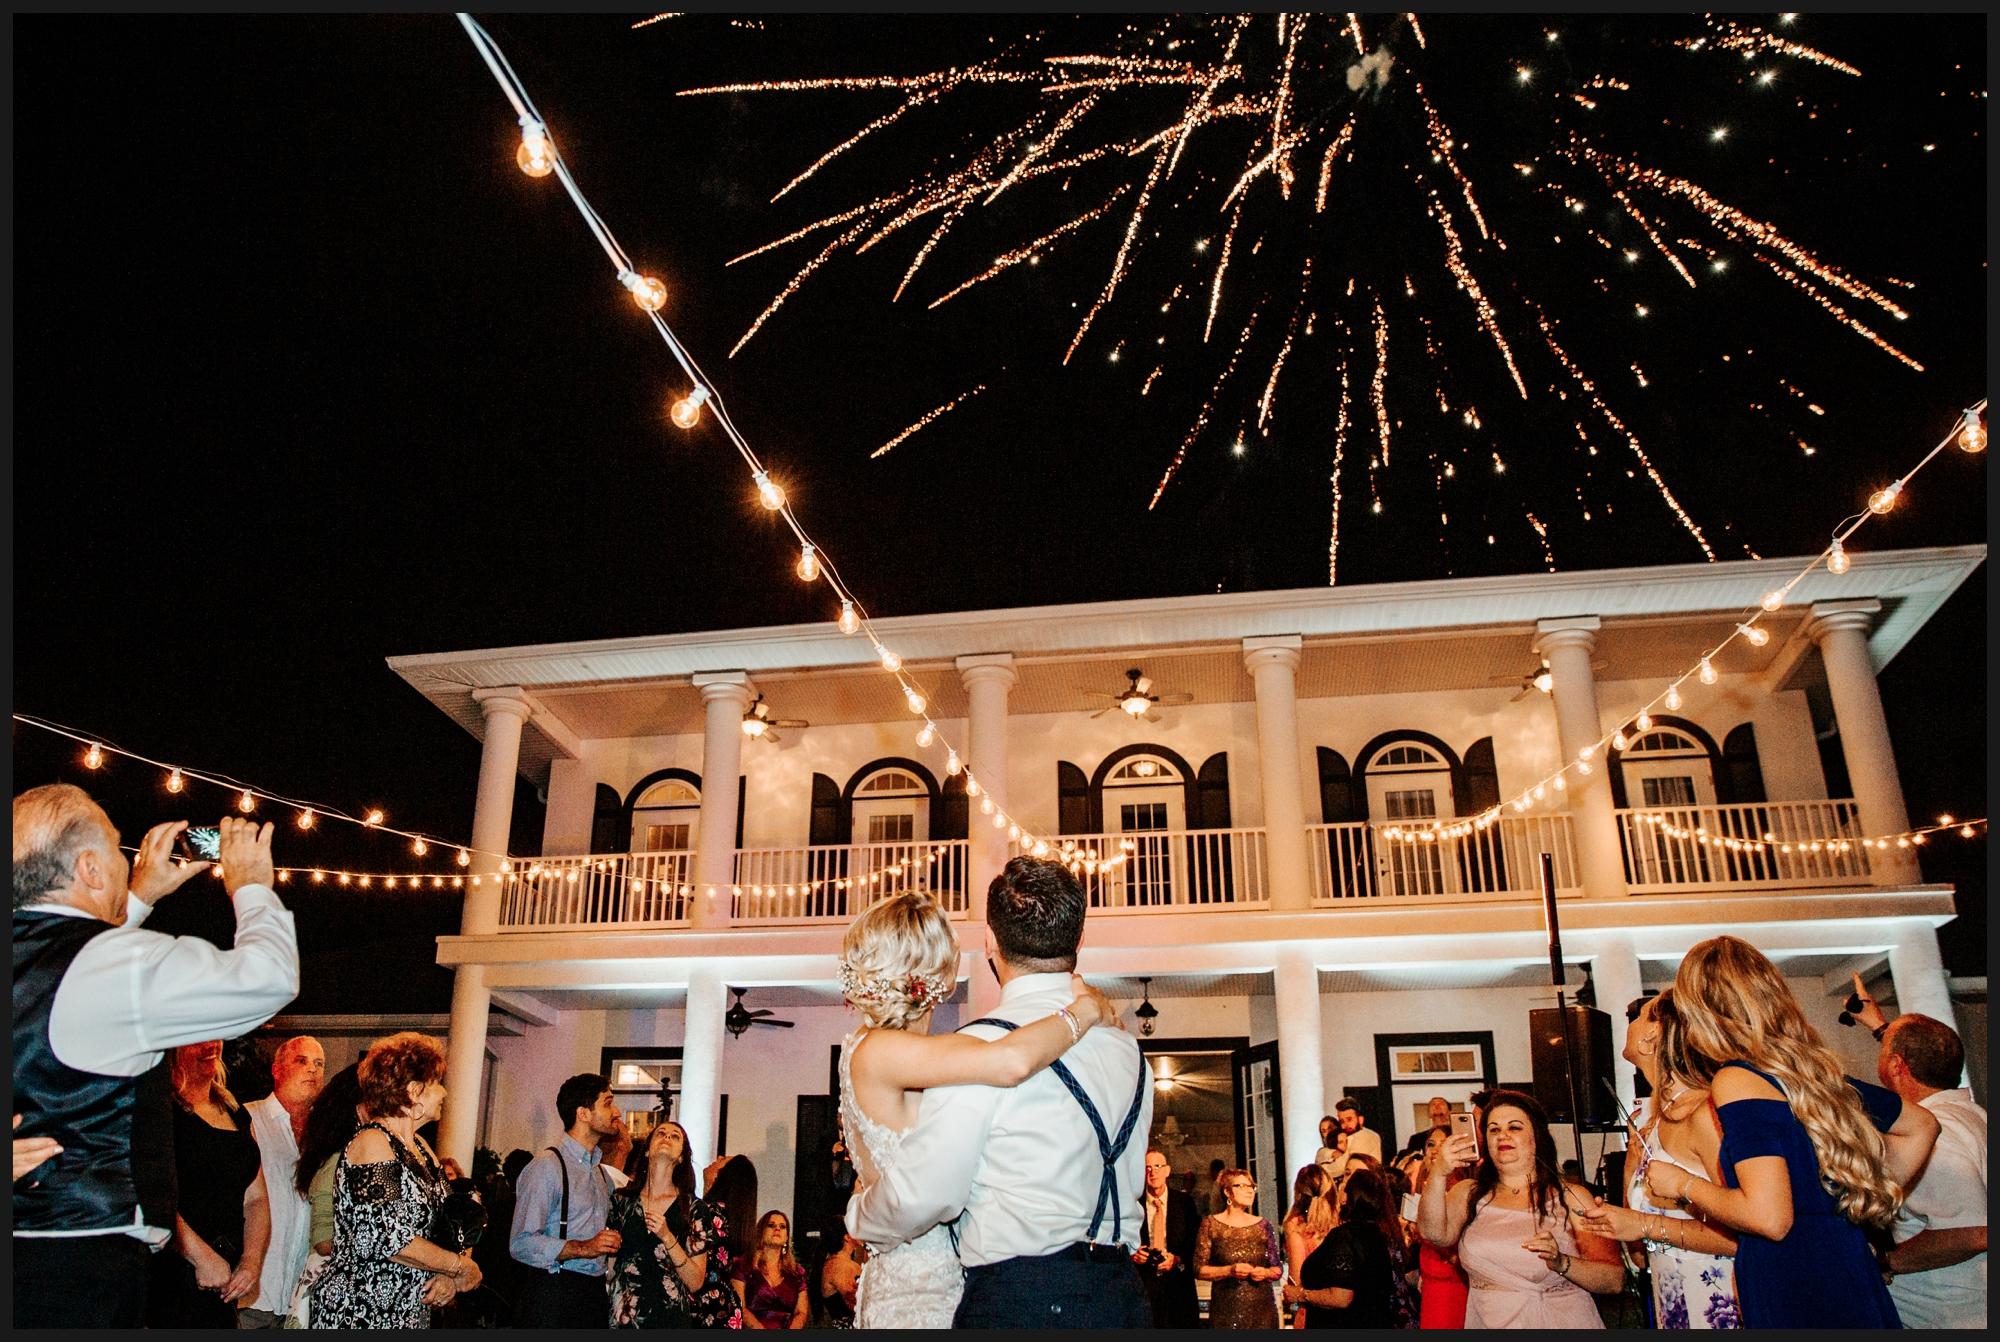 Orlando-Wedding-Photographer-destination-wedding-photographer-florida-wedding-photographer-hawaii-wedding-photographer_0630.jpg